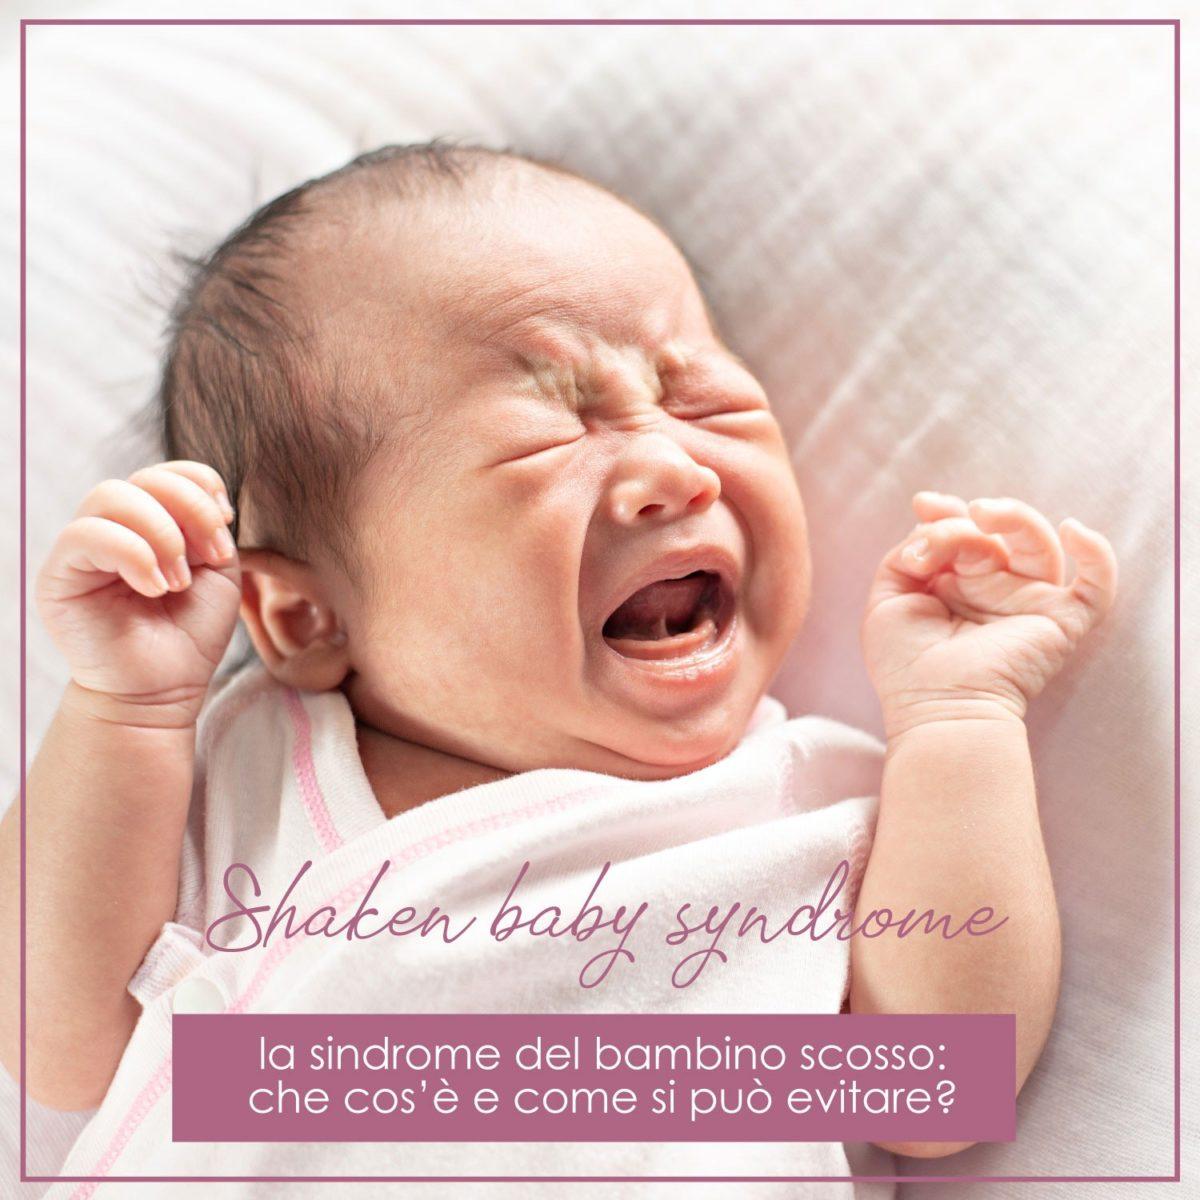 Shaken-baby-syndrome-la-sindrome-del-bambino-scosso-B-Woman--1200x1200.jpg